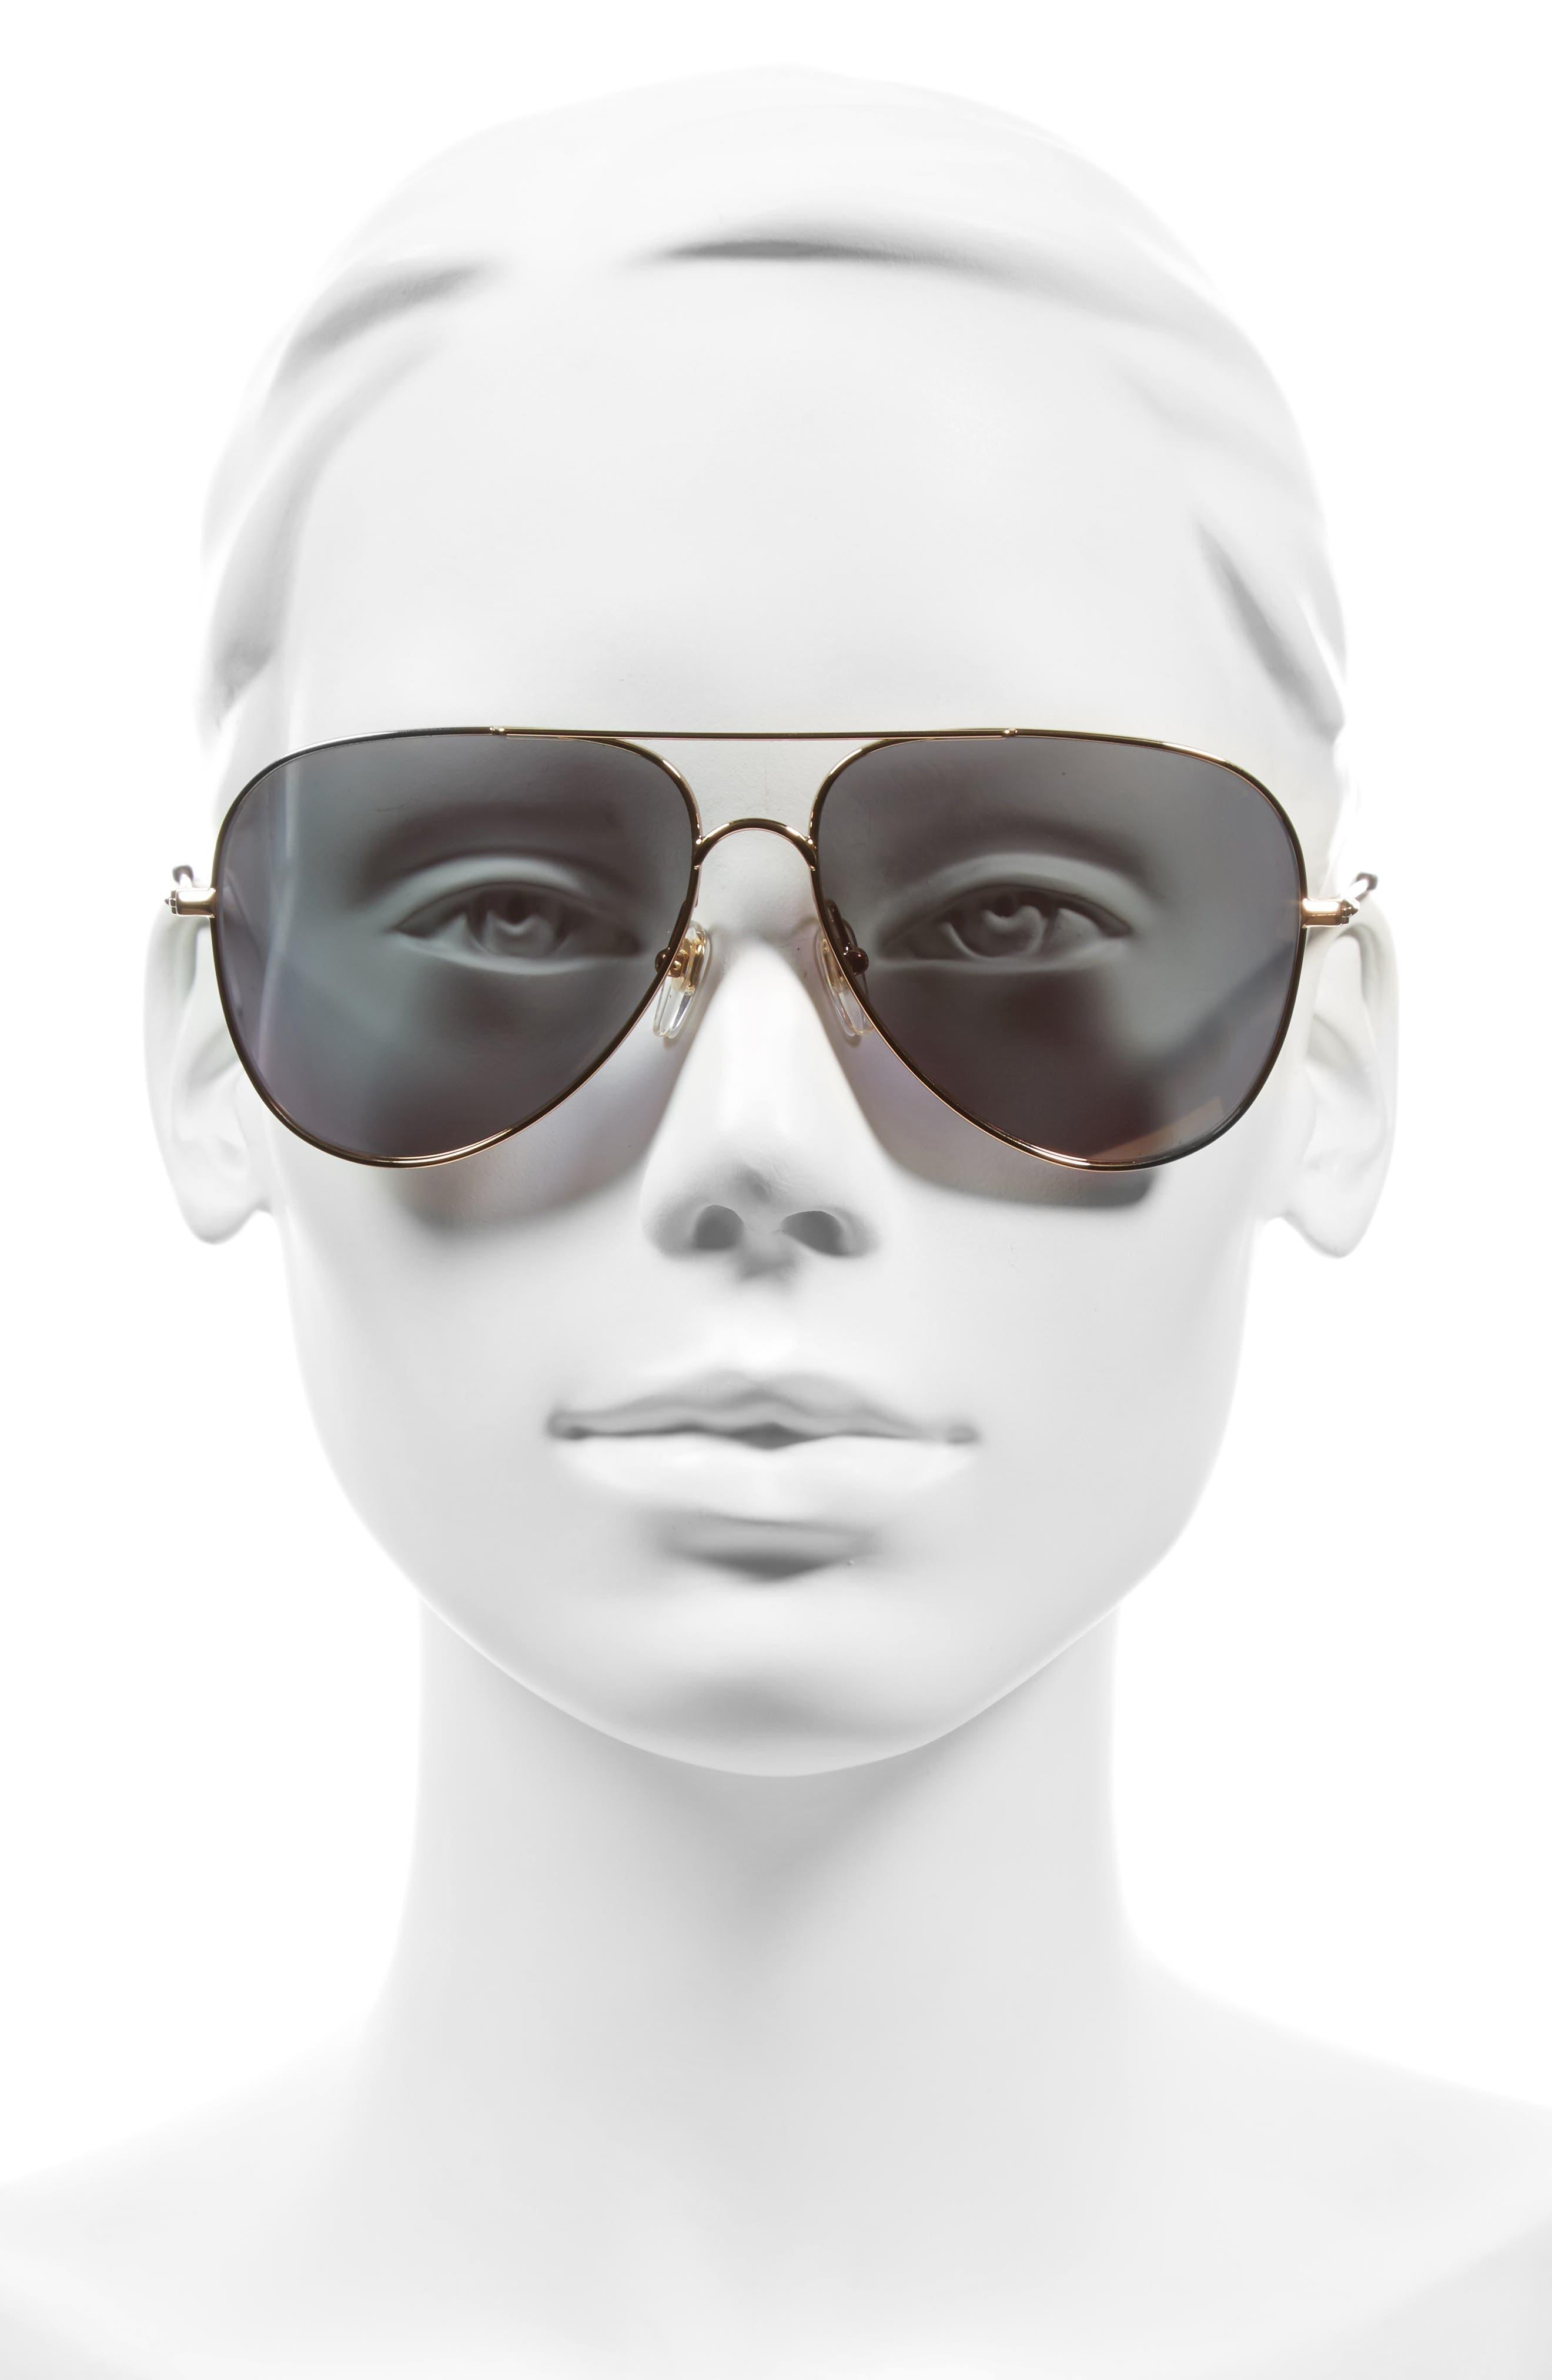 60mm Aviator Sunglasses,                             Alternate thumbnail 3, color,                             AMBER